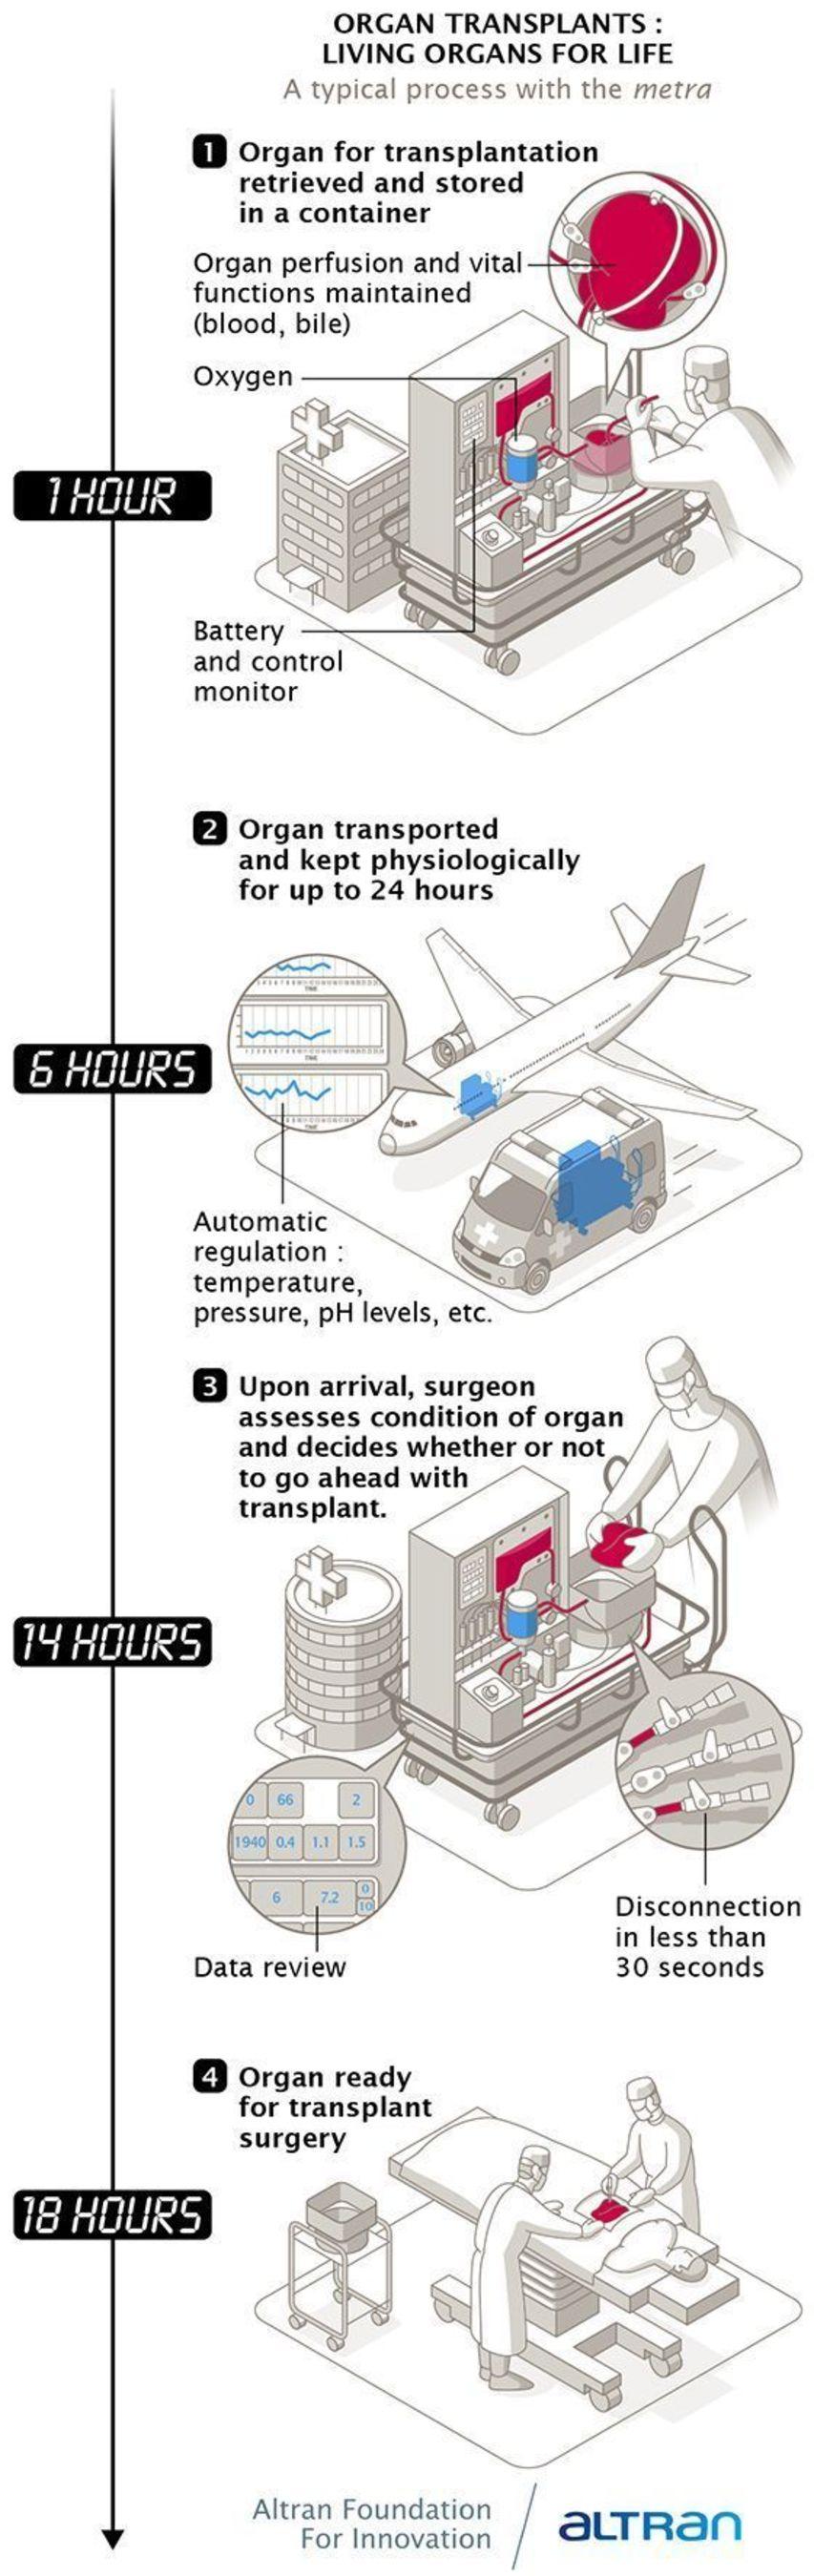 Infography Altran Foundation: an intelligent device for organ transplants. (PRNewsFoto/Altran)